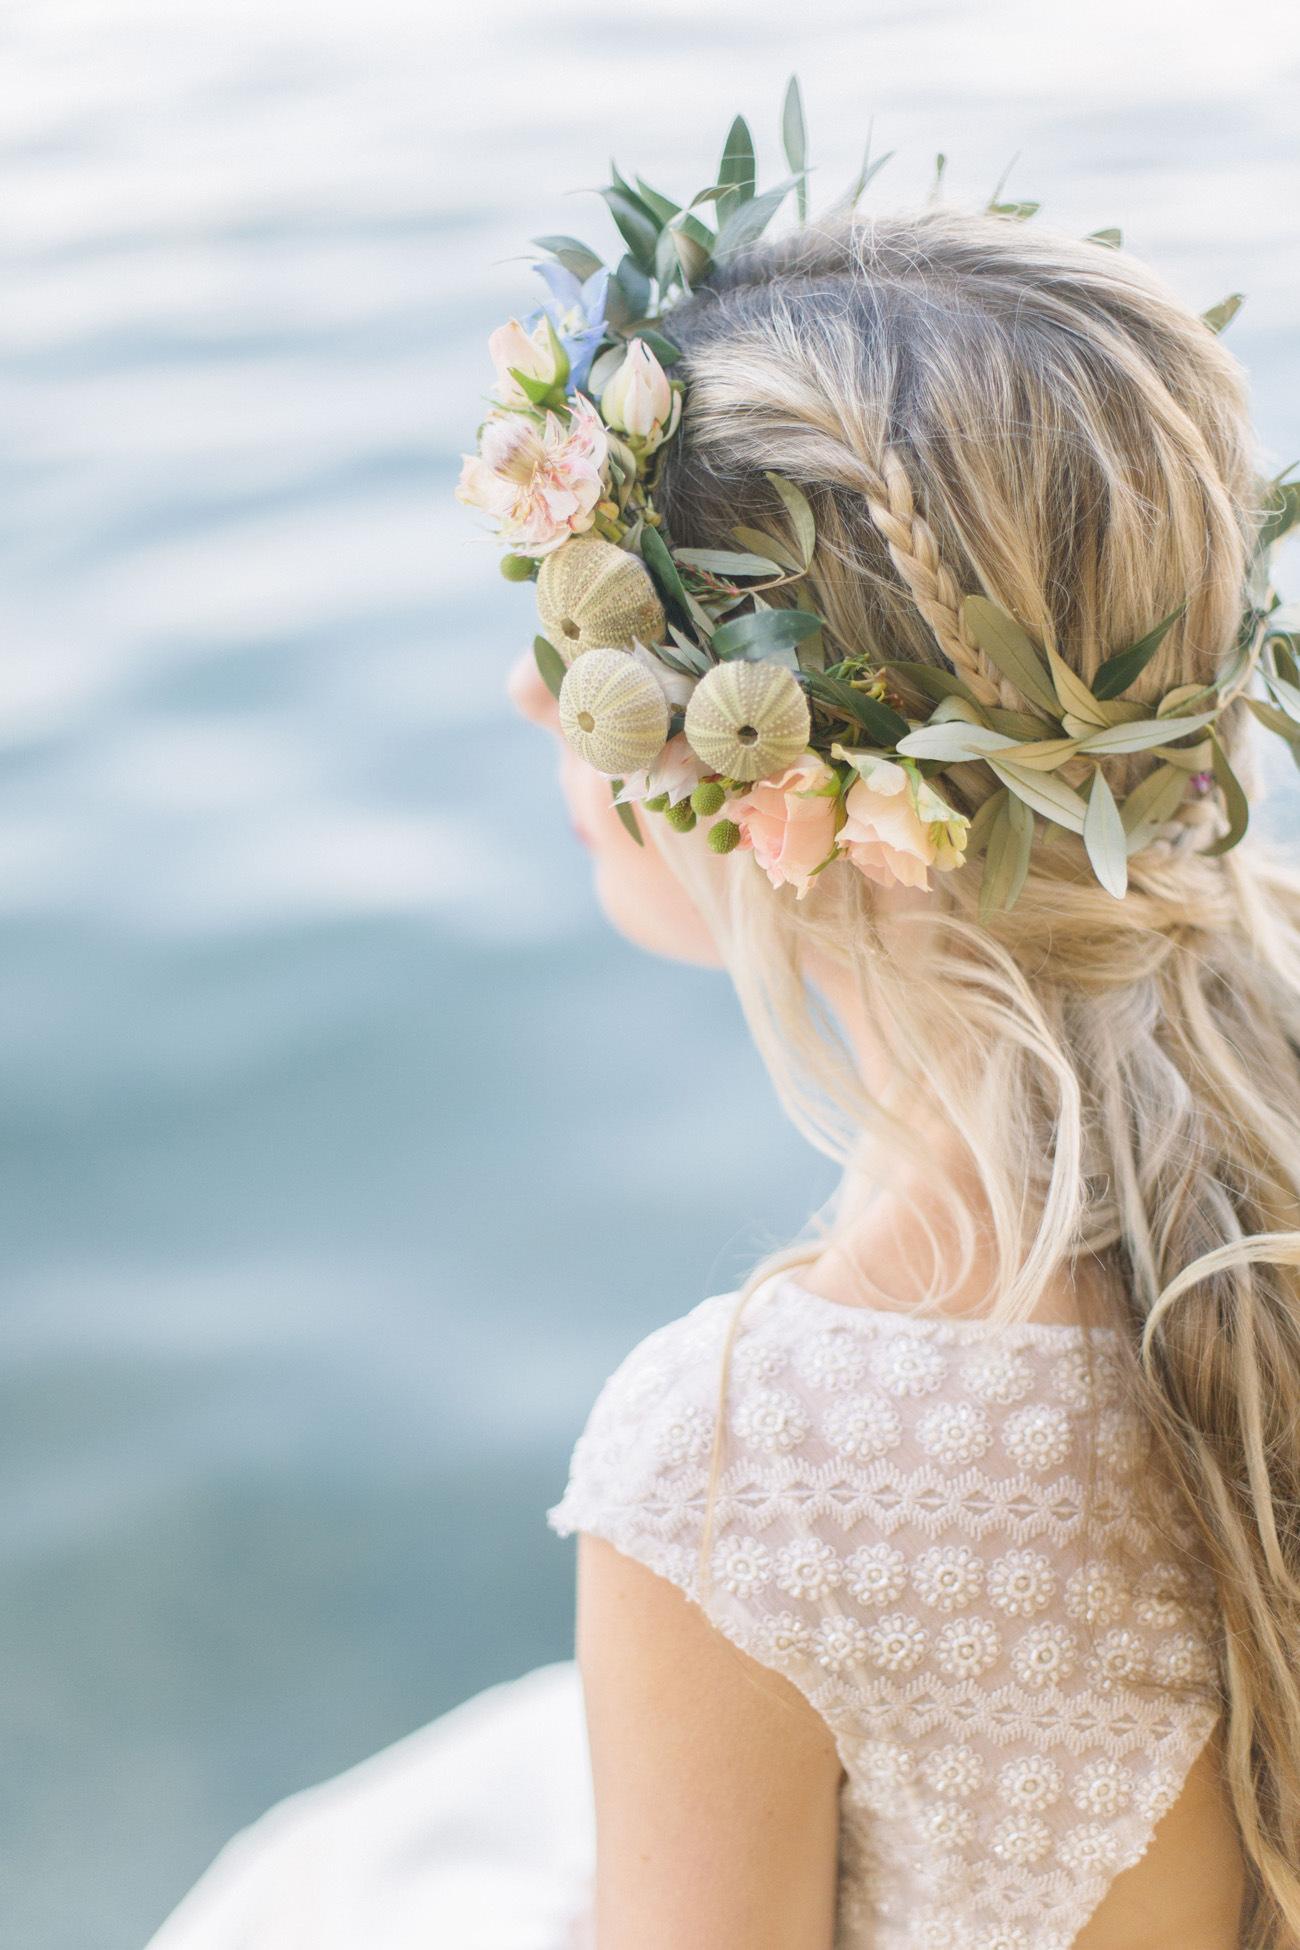 Boho Beach Bride Urchin Flower Crown